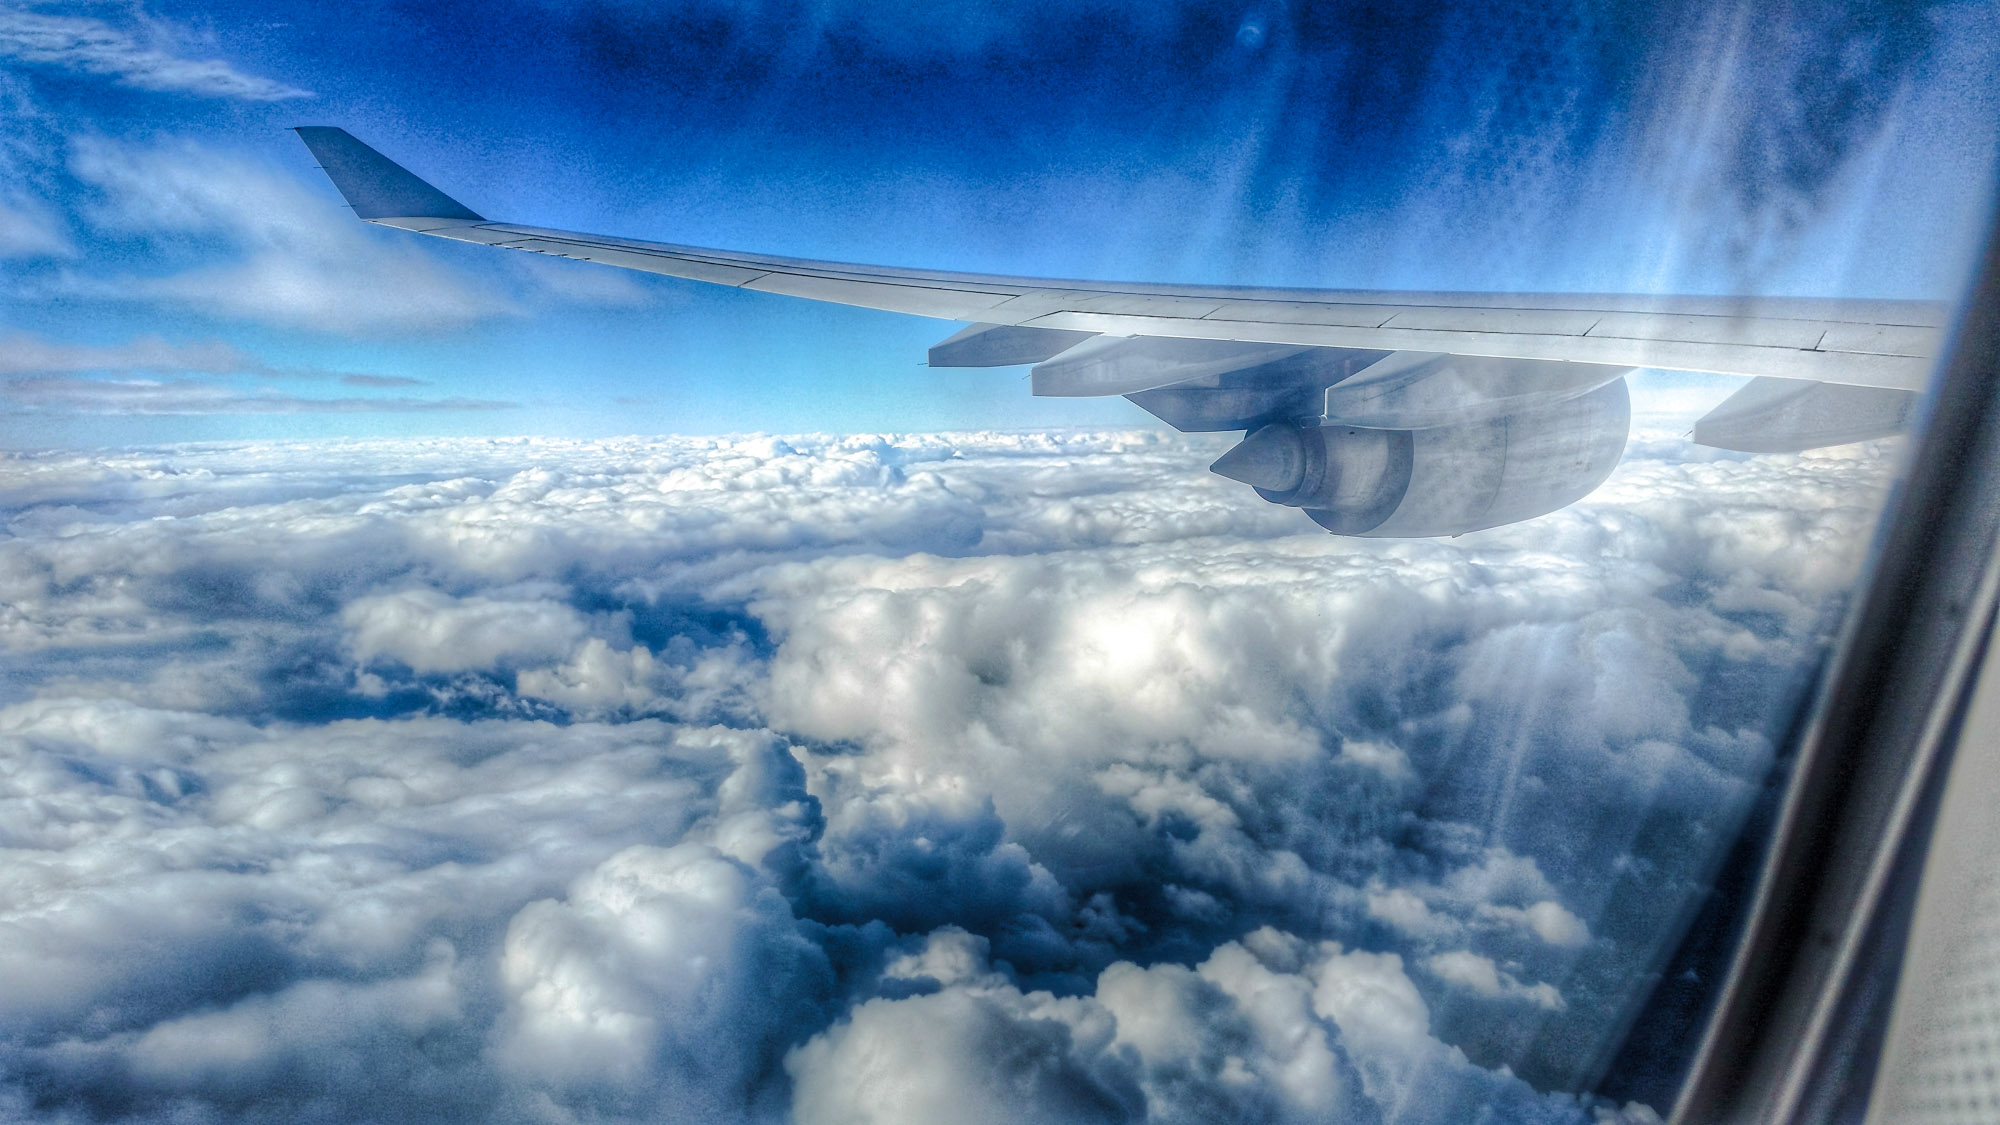 Handyfotos aus dem Flugzeug